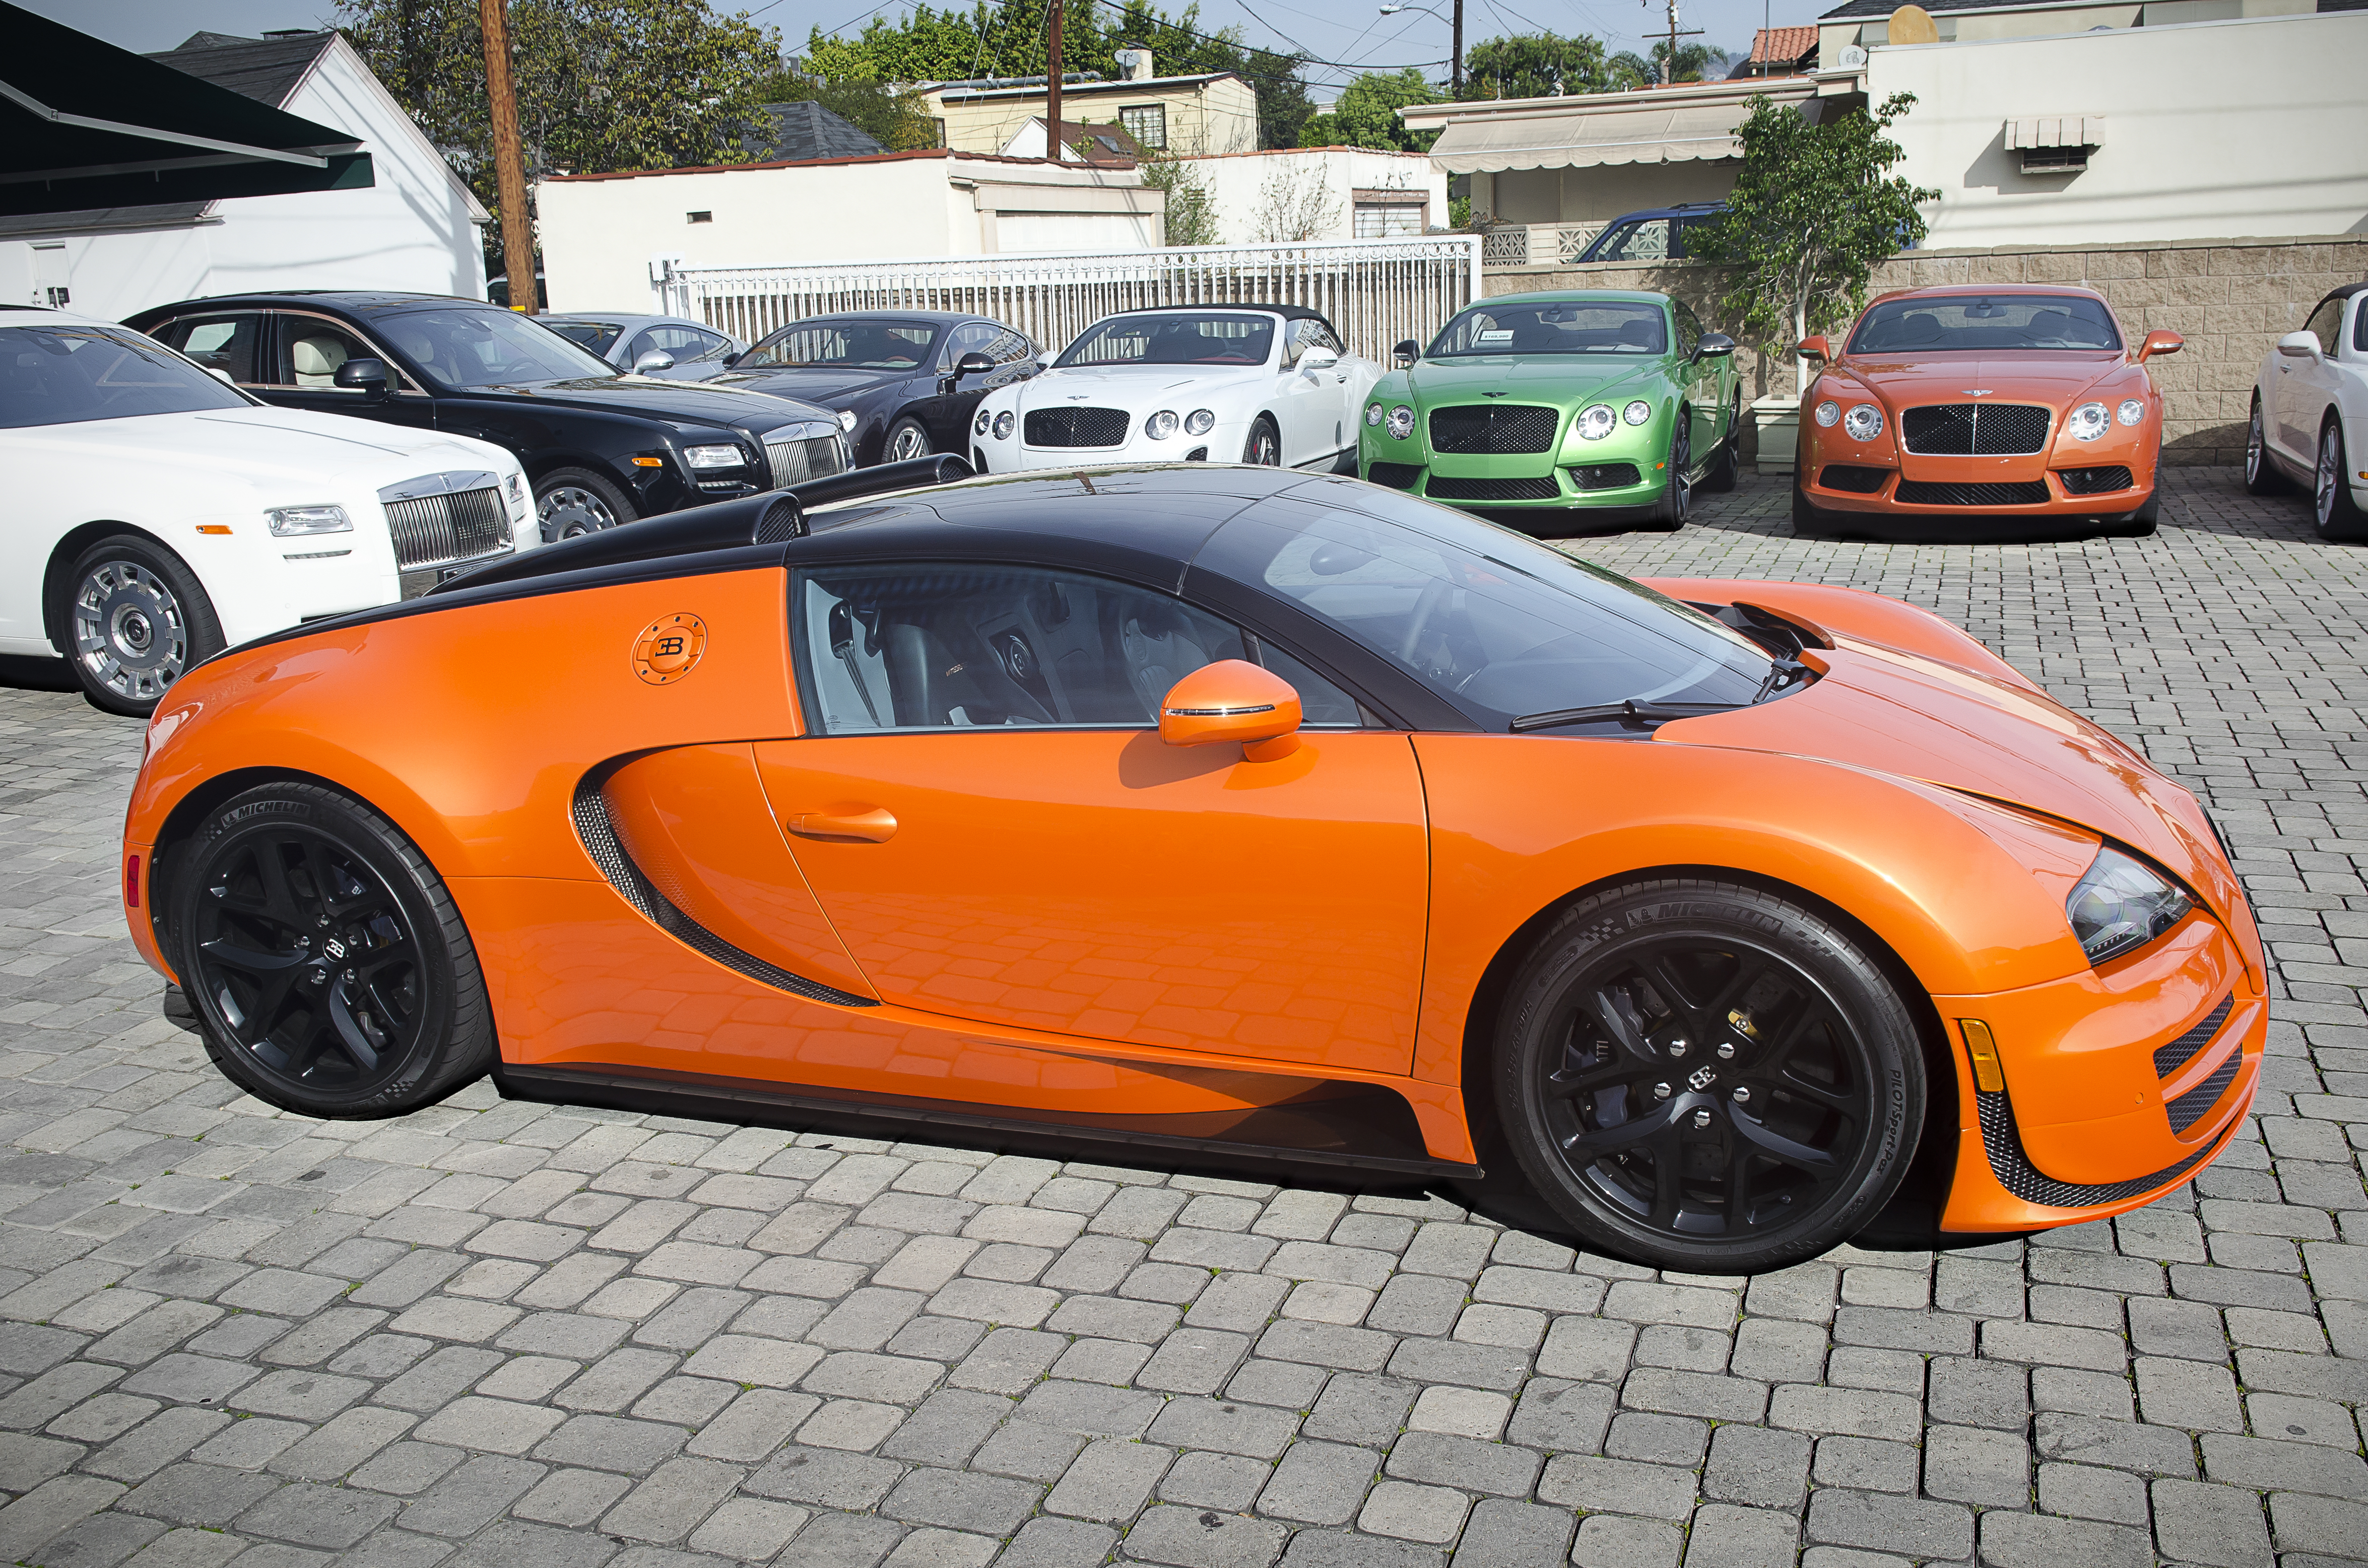 Orange_Bugatti_Veyron_Grand_Sport_Vitesse_%2812570420484%29 Amazing Bugatti Veyron Grand Sport Vitesse Information Cars Trend